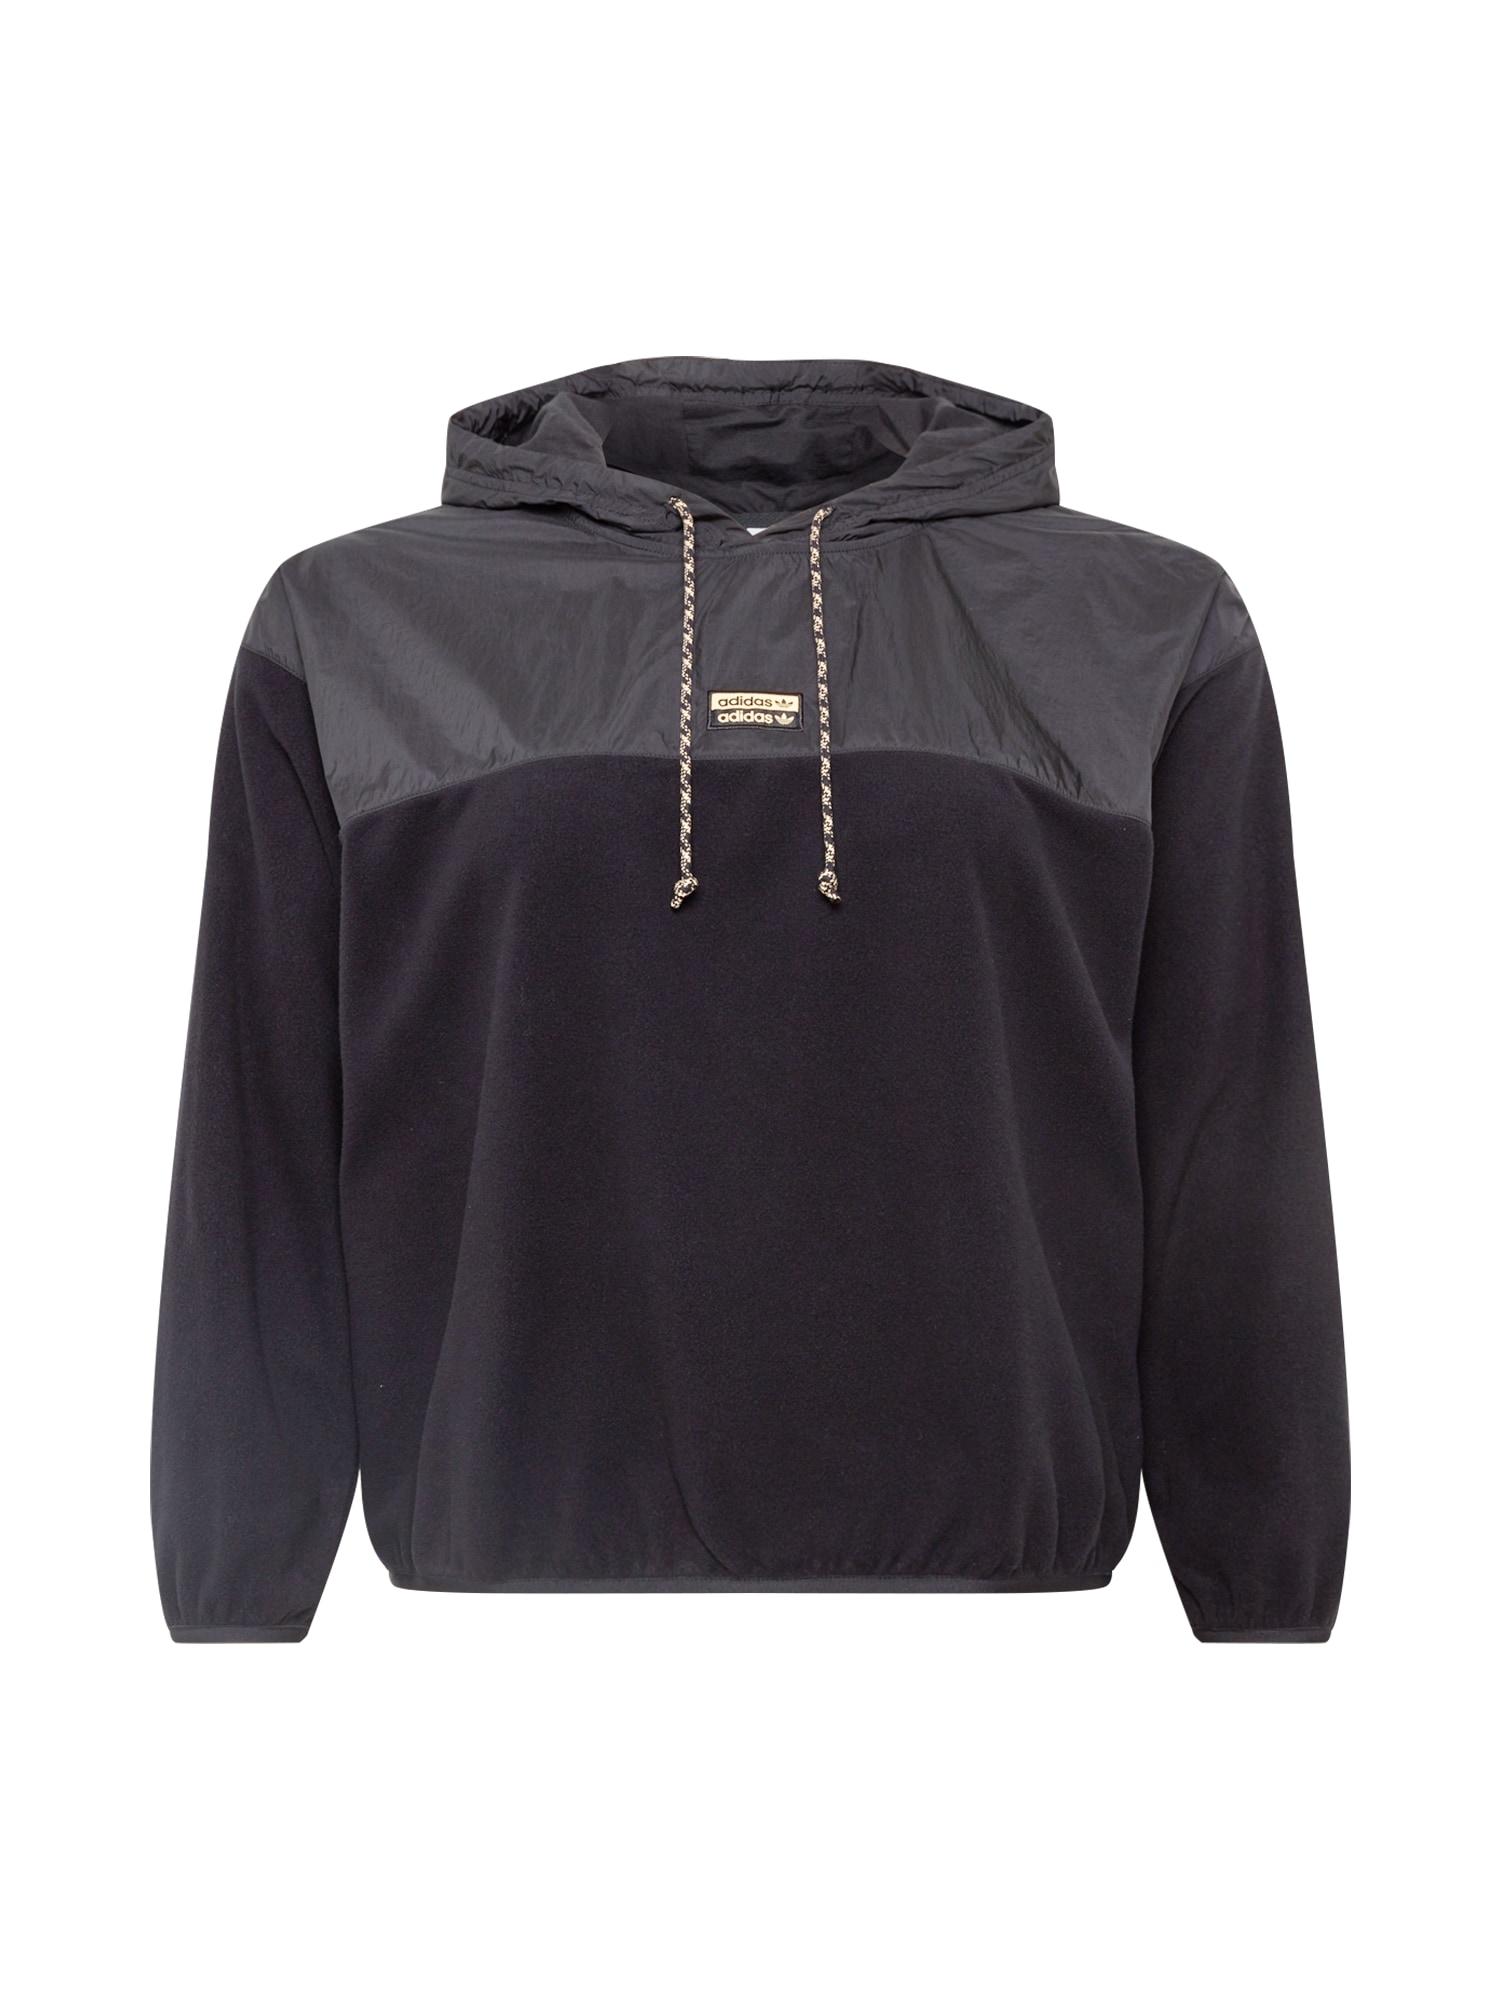 ADIDAS ORIGINALS Megztinis juoda